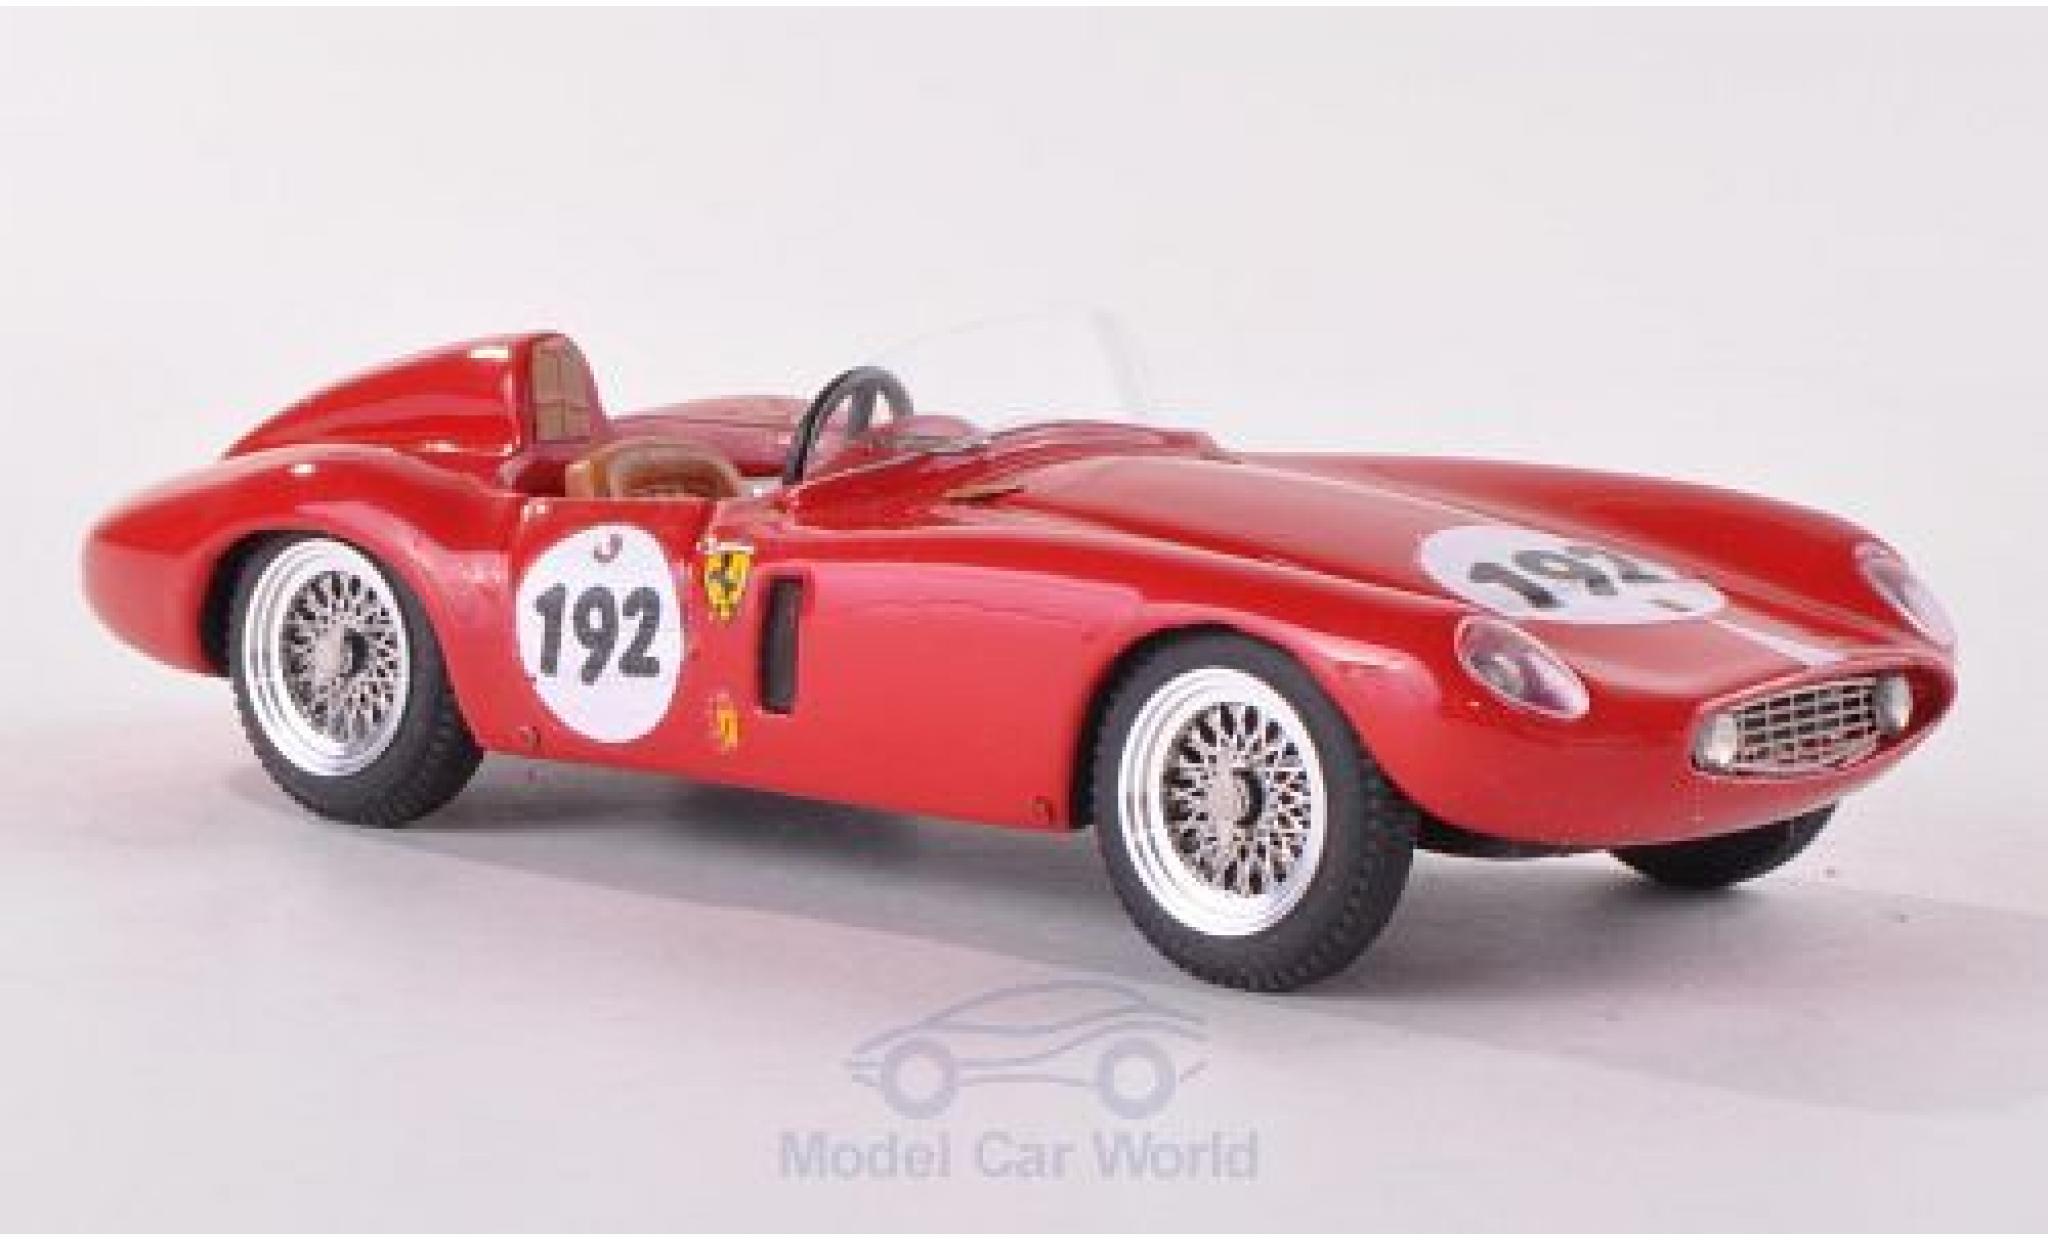 Ferrari 750 1/43 Jolly Model No.192 Targa Florio 1960 Tramontana